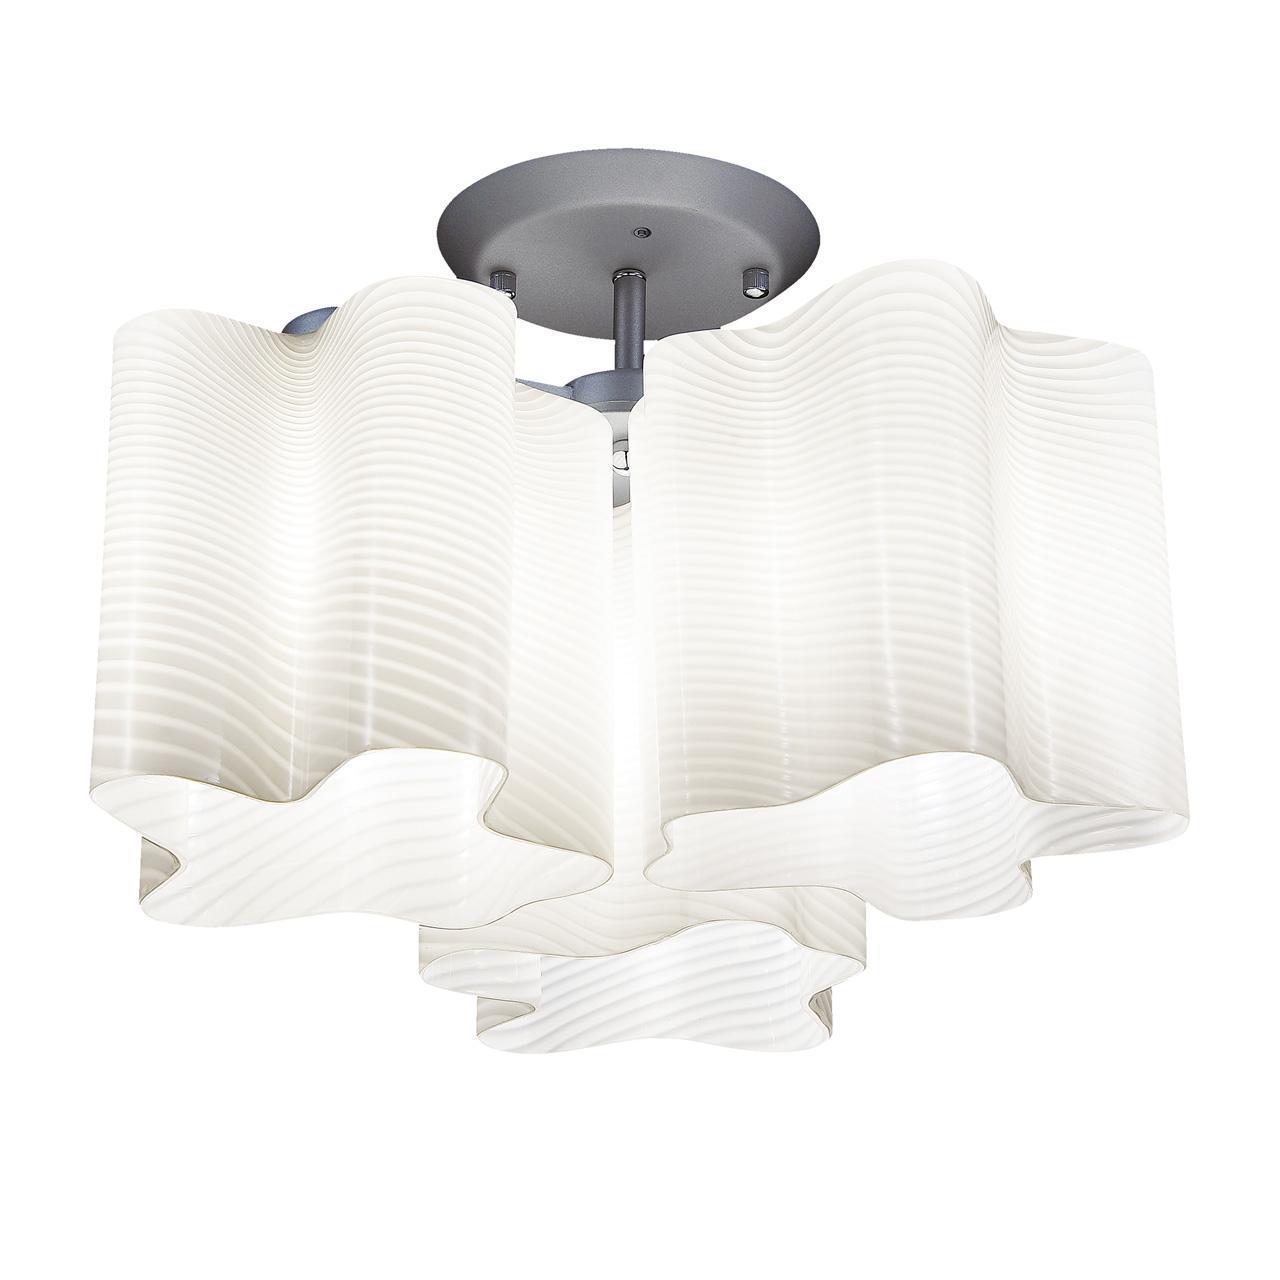 Потолочный светильник Lightstar 802031, белый lightstar ronna 726061